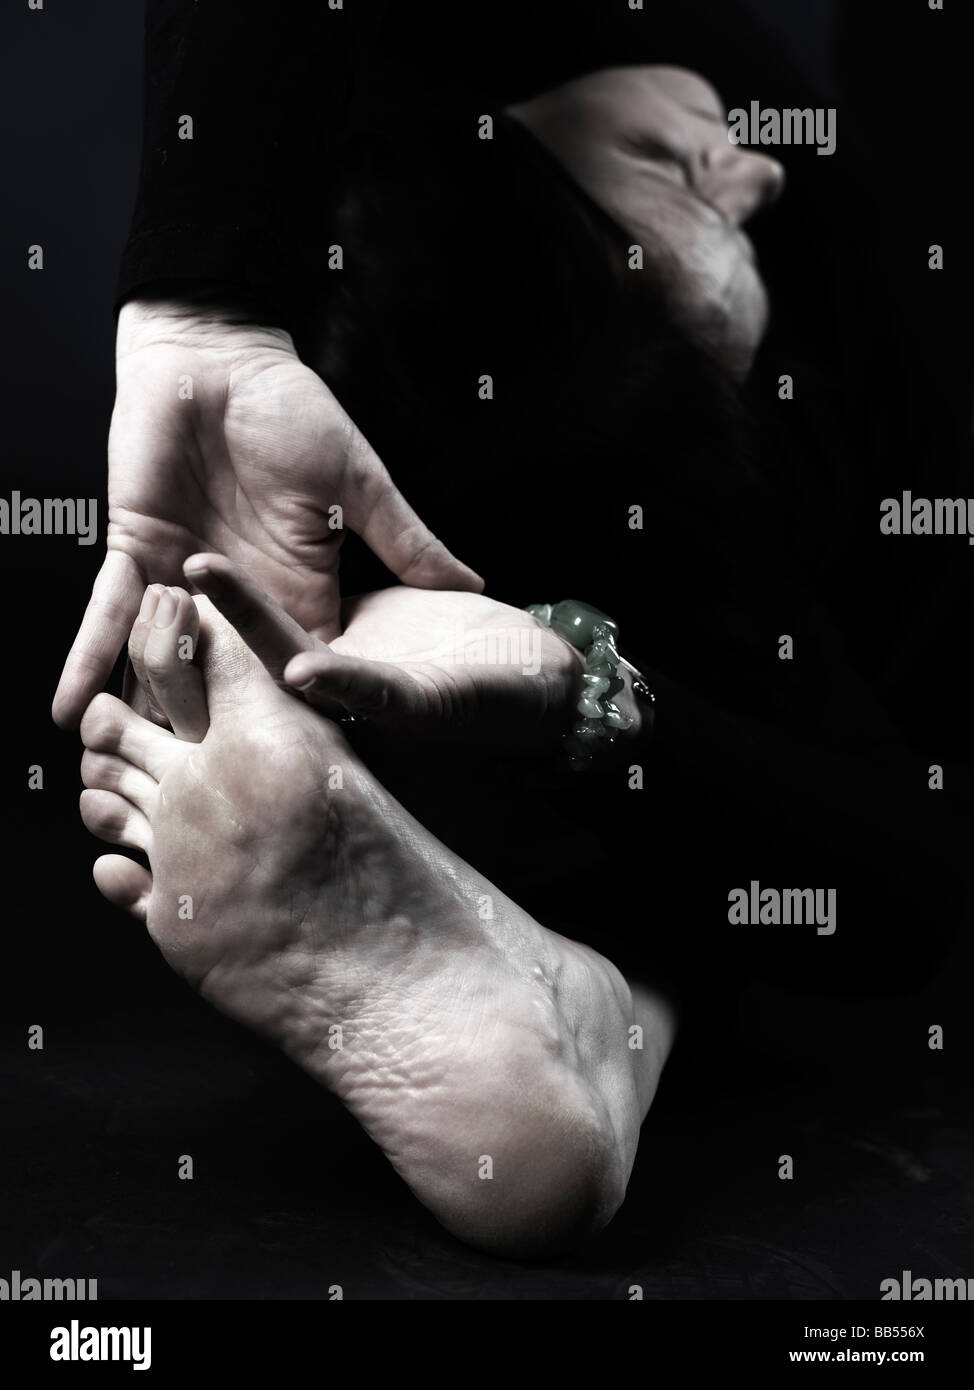 Parivrtta Janu Sirsasana (Revolved Head-to-Knee Pose) yoga detail - Stock Image